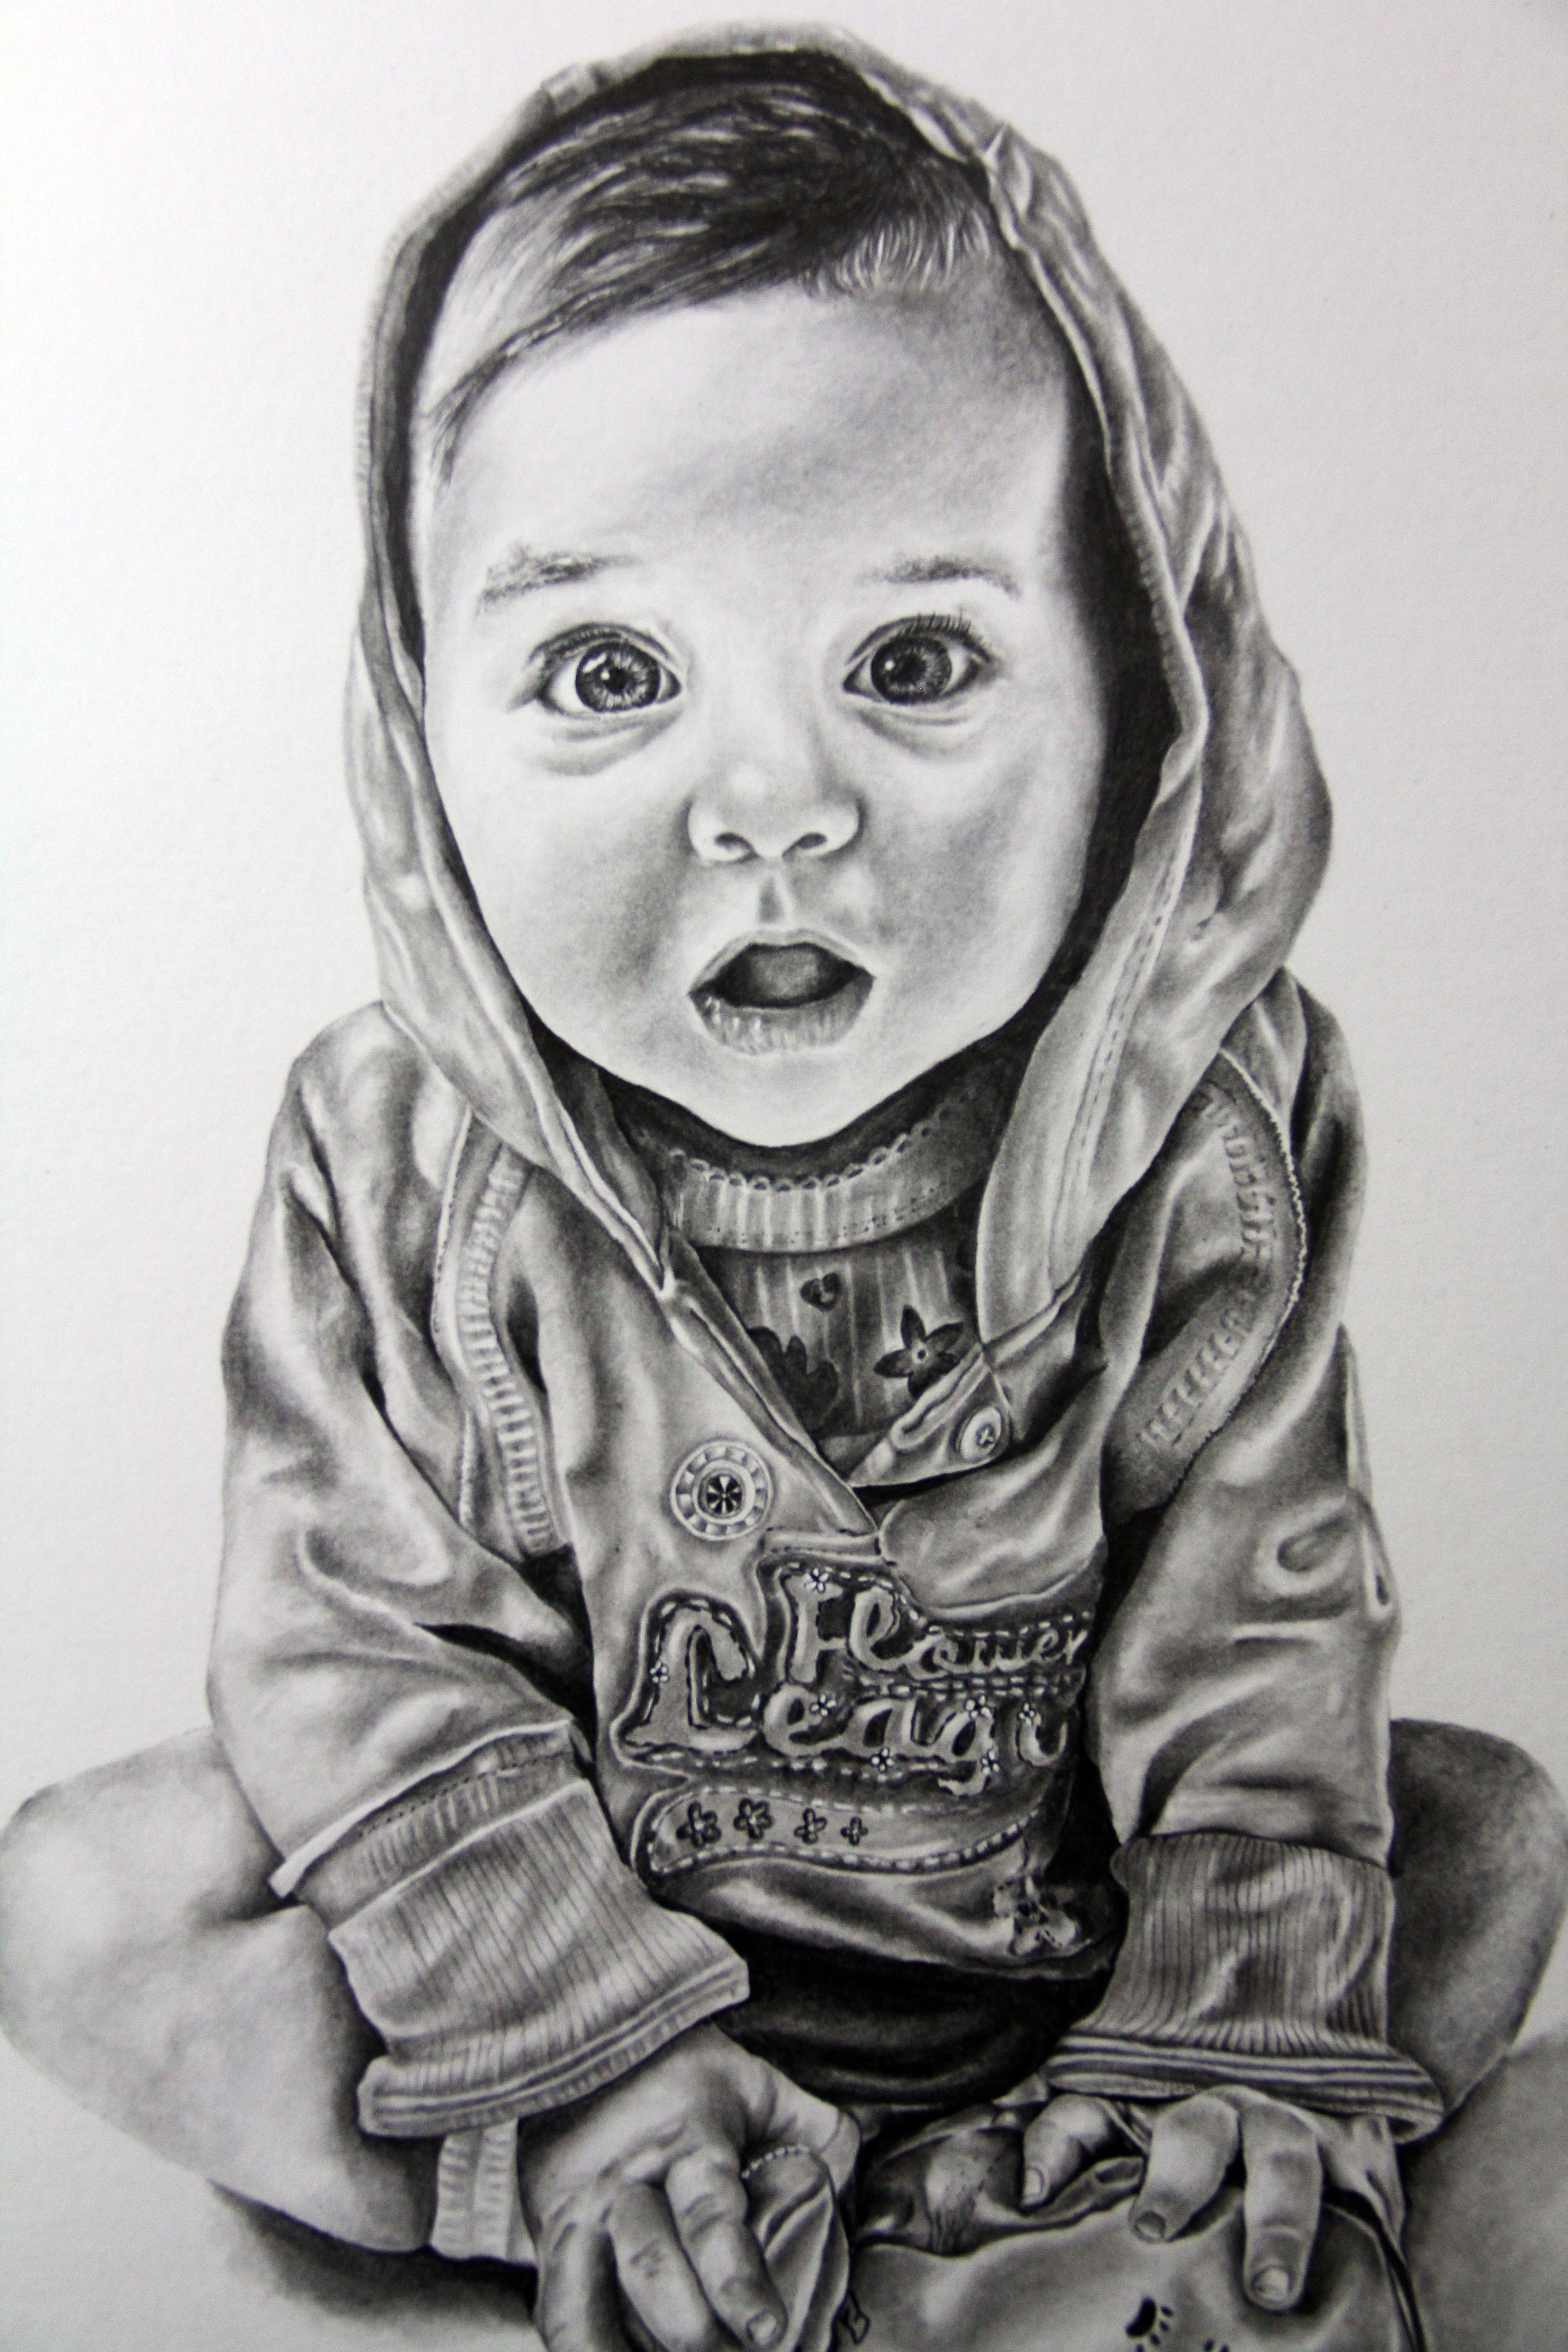 Baby child art portrait in pencil drawing by iigurrydaddyii